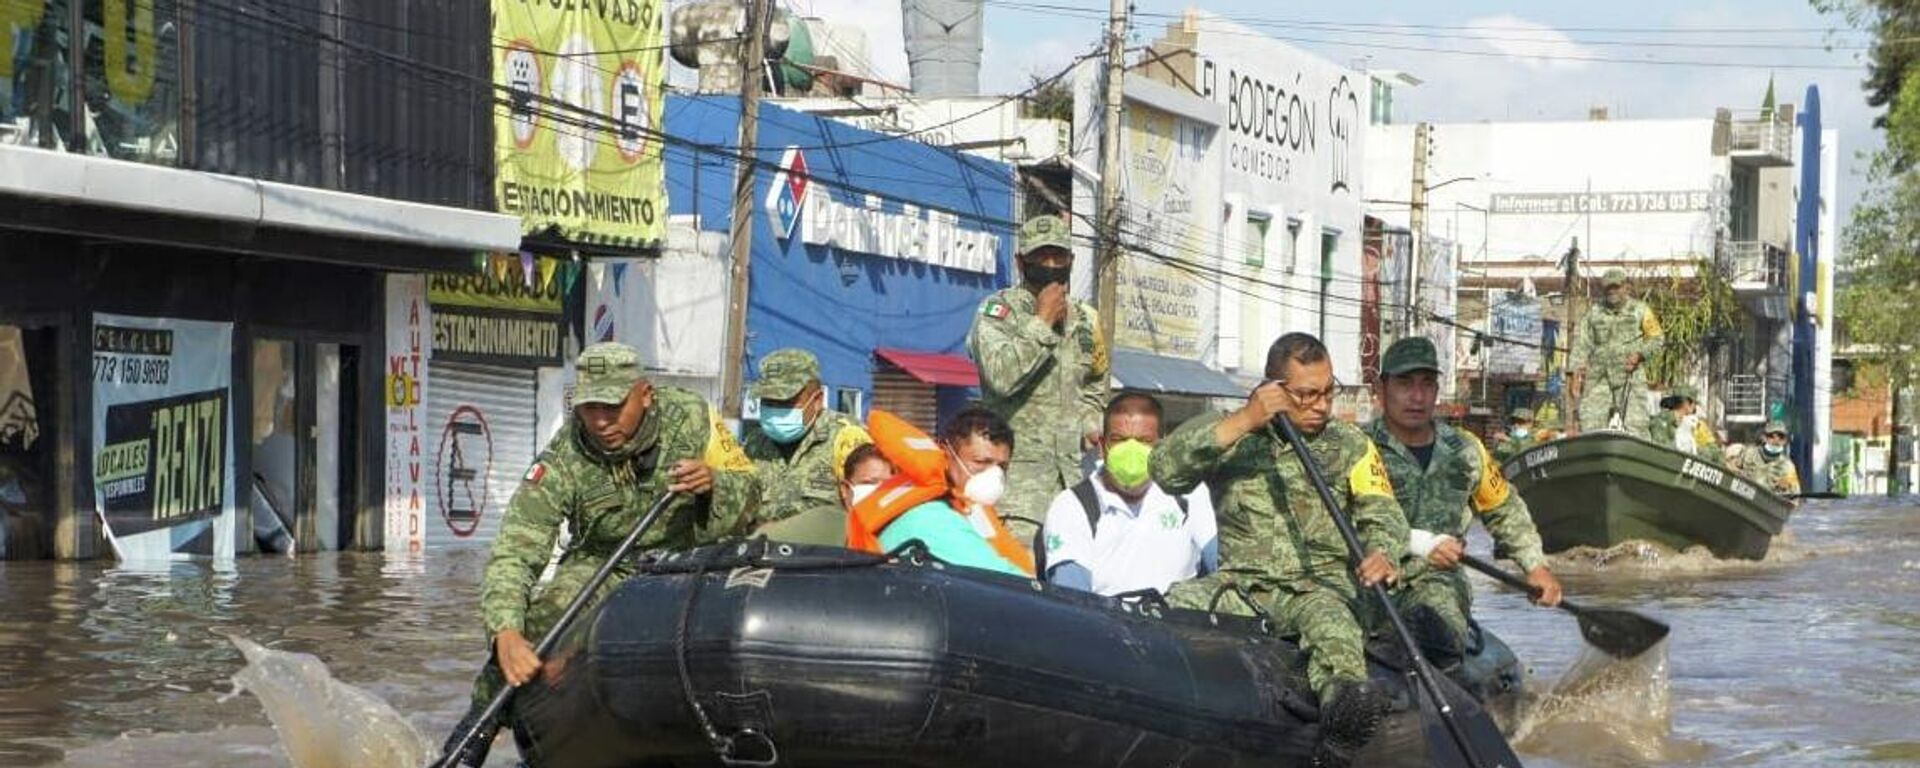 Militares mexicanos en labores de rescate.  - Sputnik Mundo, 1920, 09.09.2021